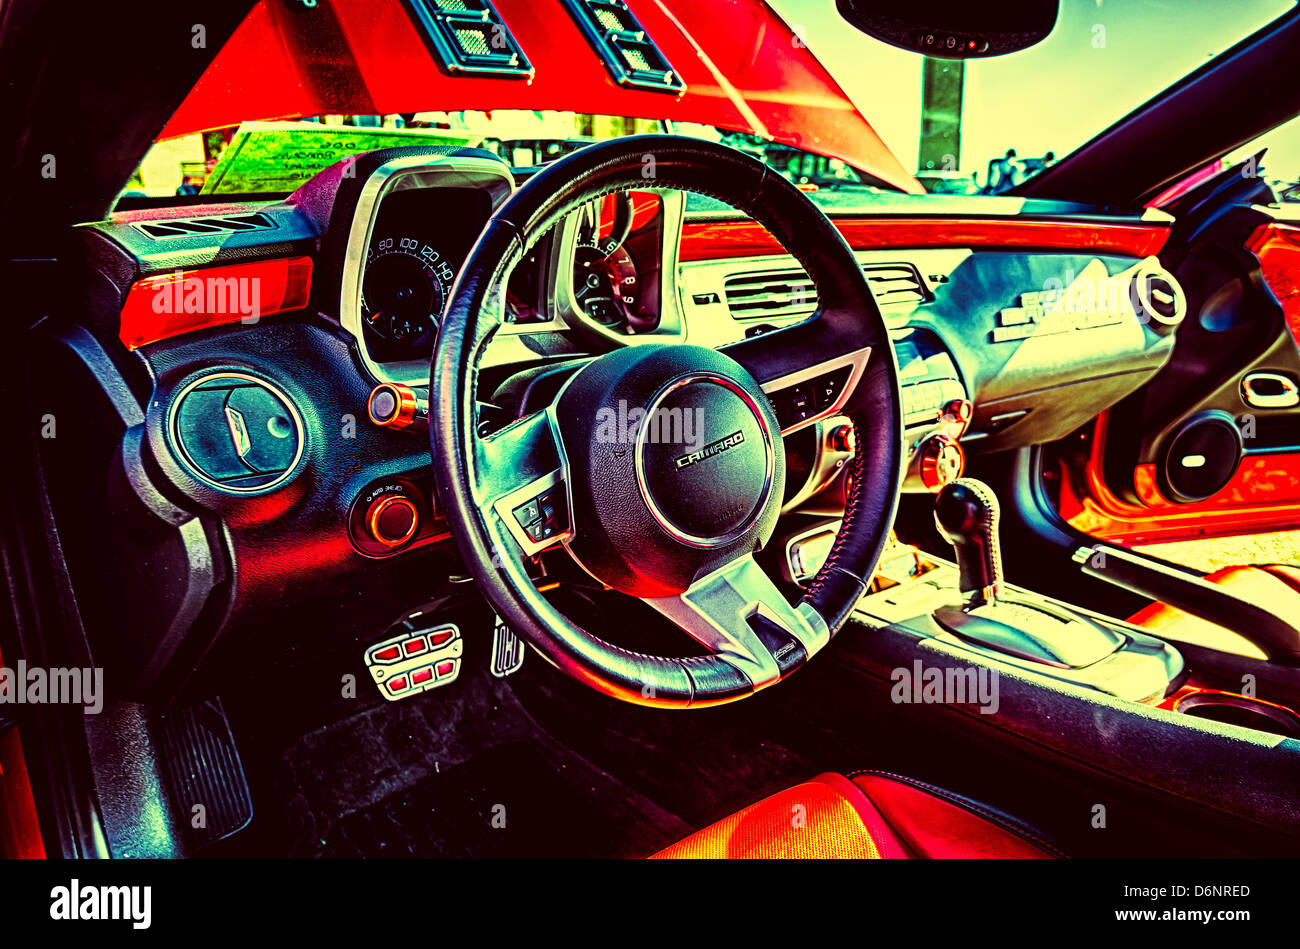 Interior of Chevy Camaro - Stock Image